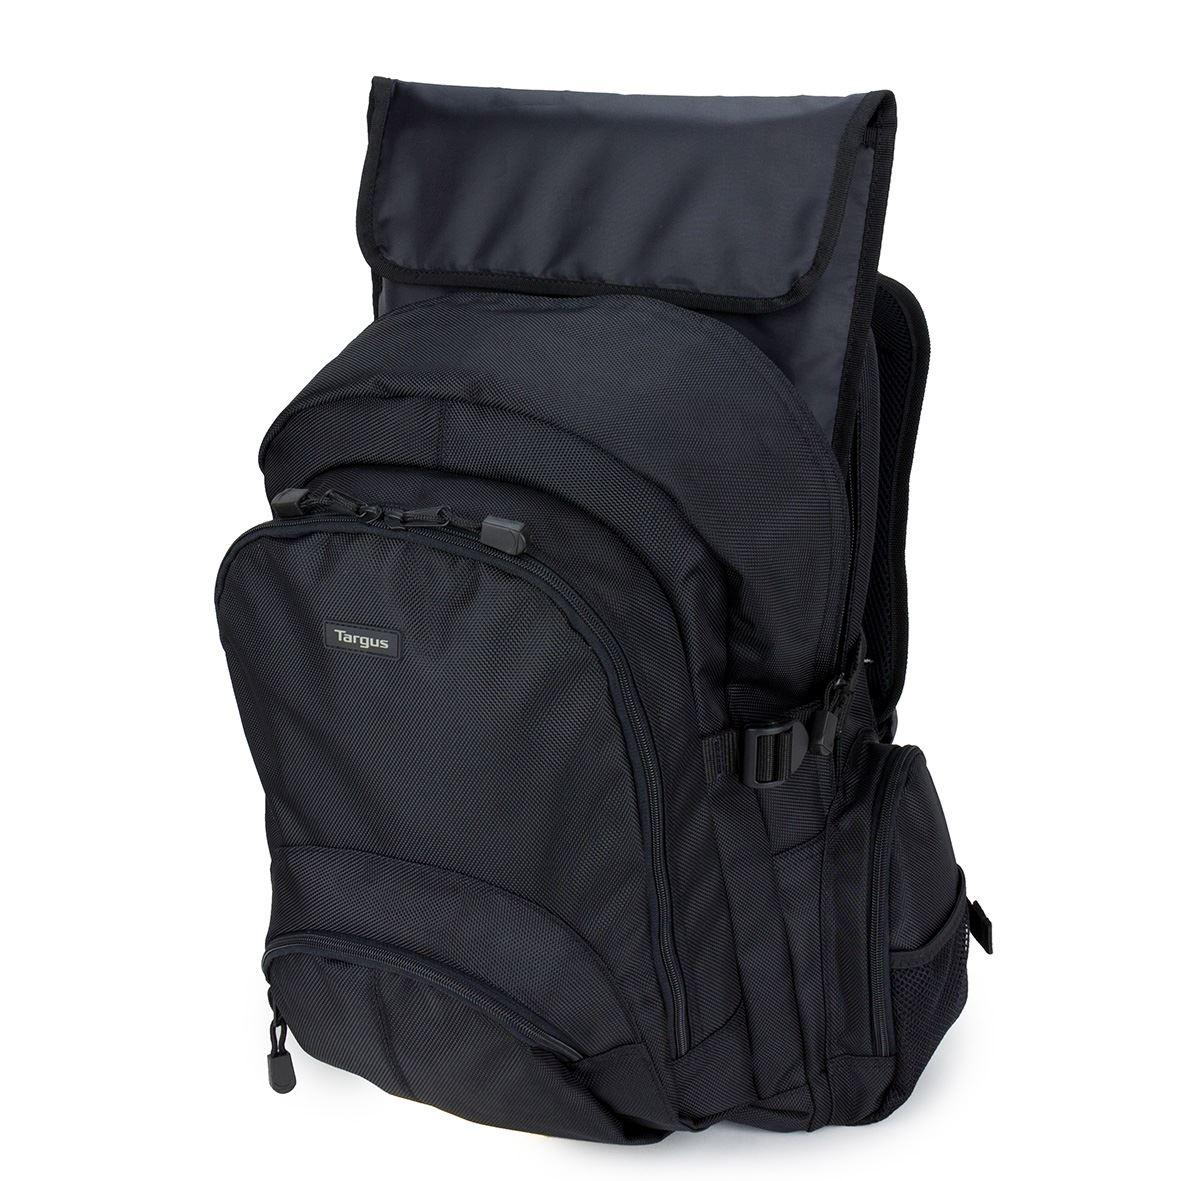 eb4d5f12af89 Seaberg Business Backpack- Fenix Toulouse Handball